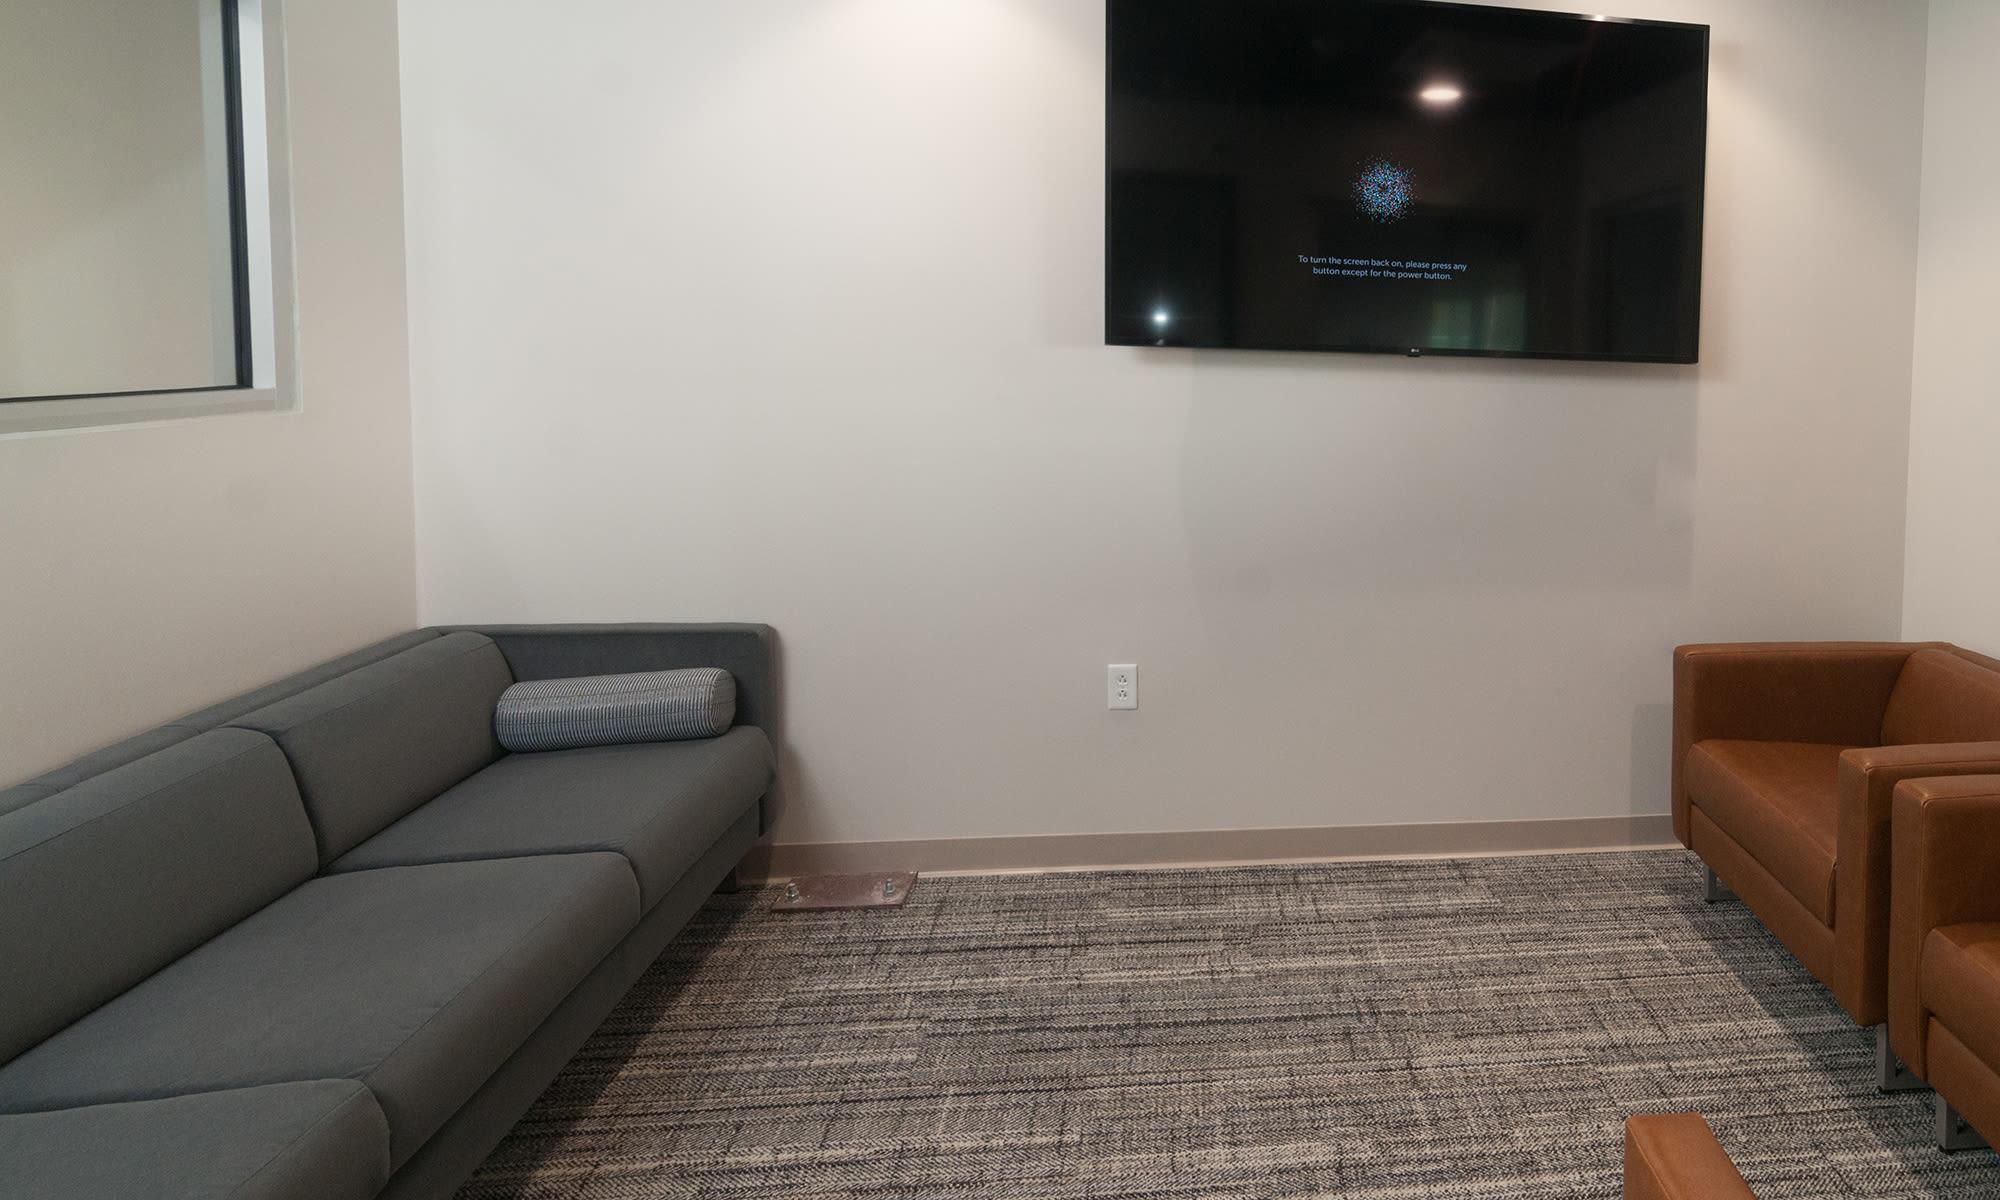 Customer Lounge (The Bullpen) at Virginia Varsity Self Storage in Roanoke, Virginia is located